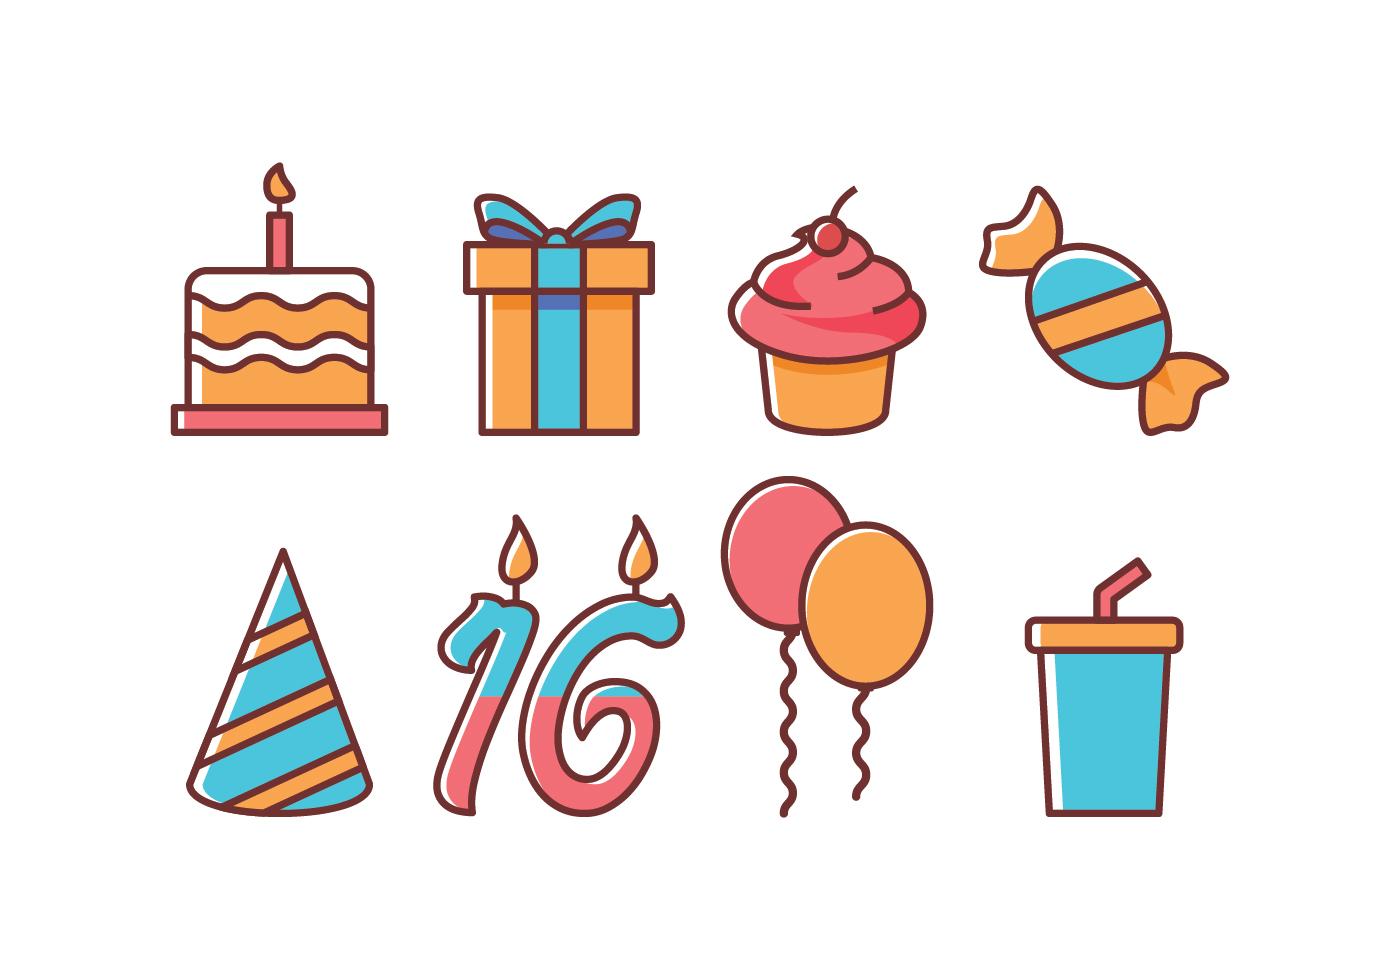 Geburtstags Icons